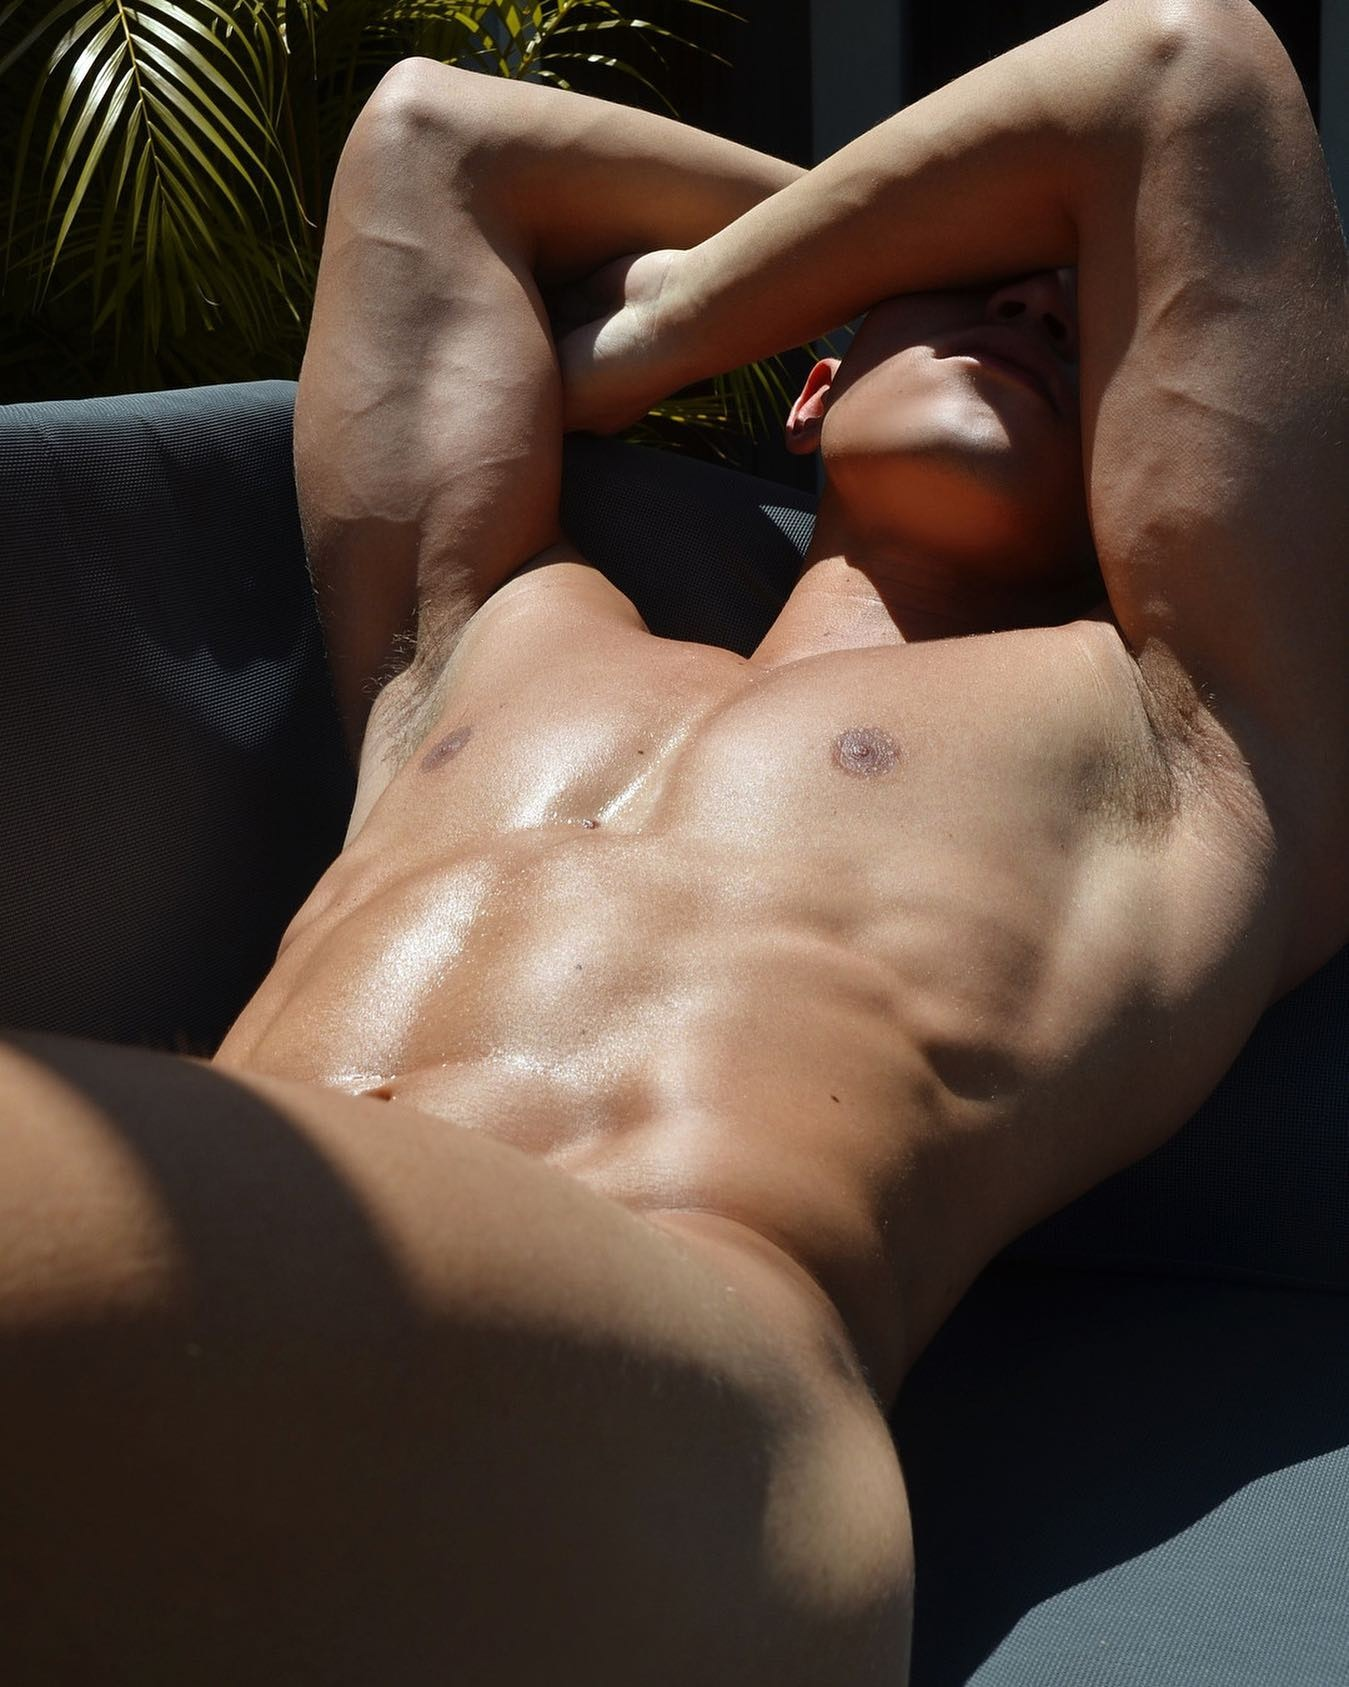 #men #muscular #armpits #sixpack #abs #shirtlessguys #gaymen #hotmen #sexymen